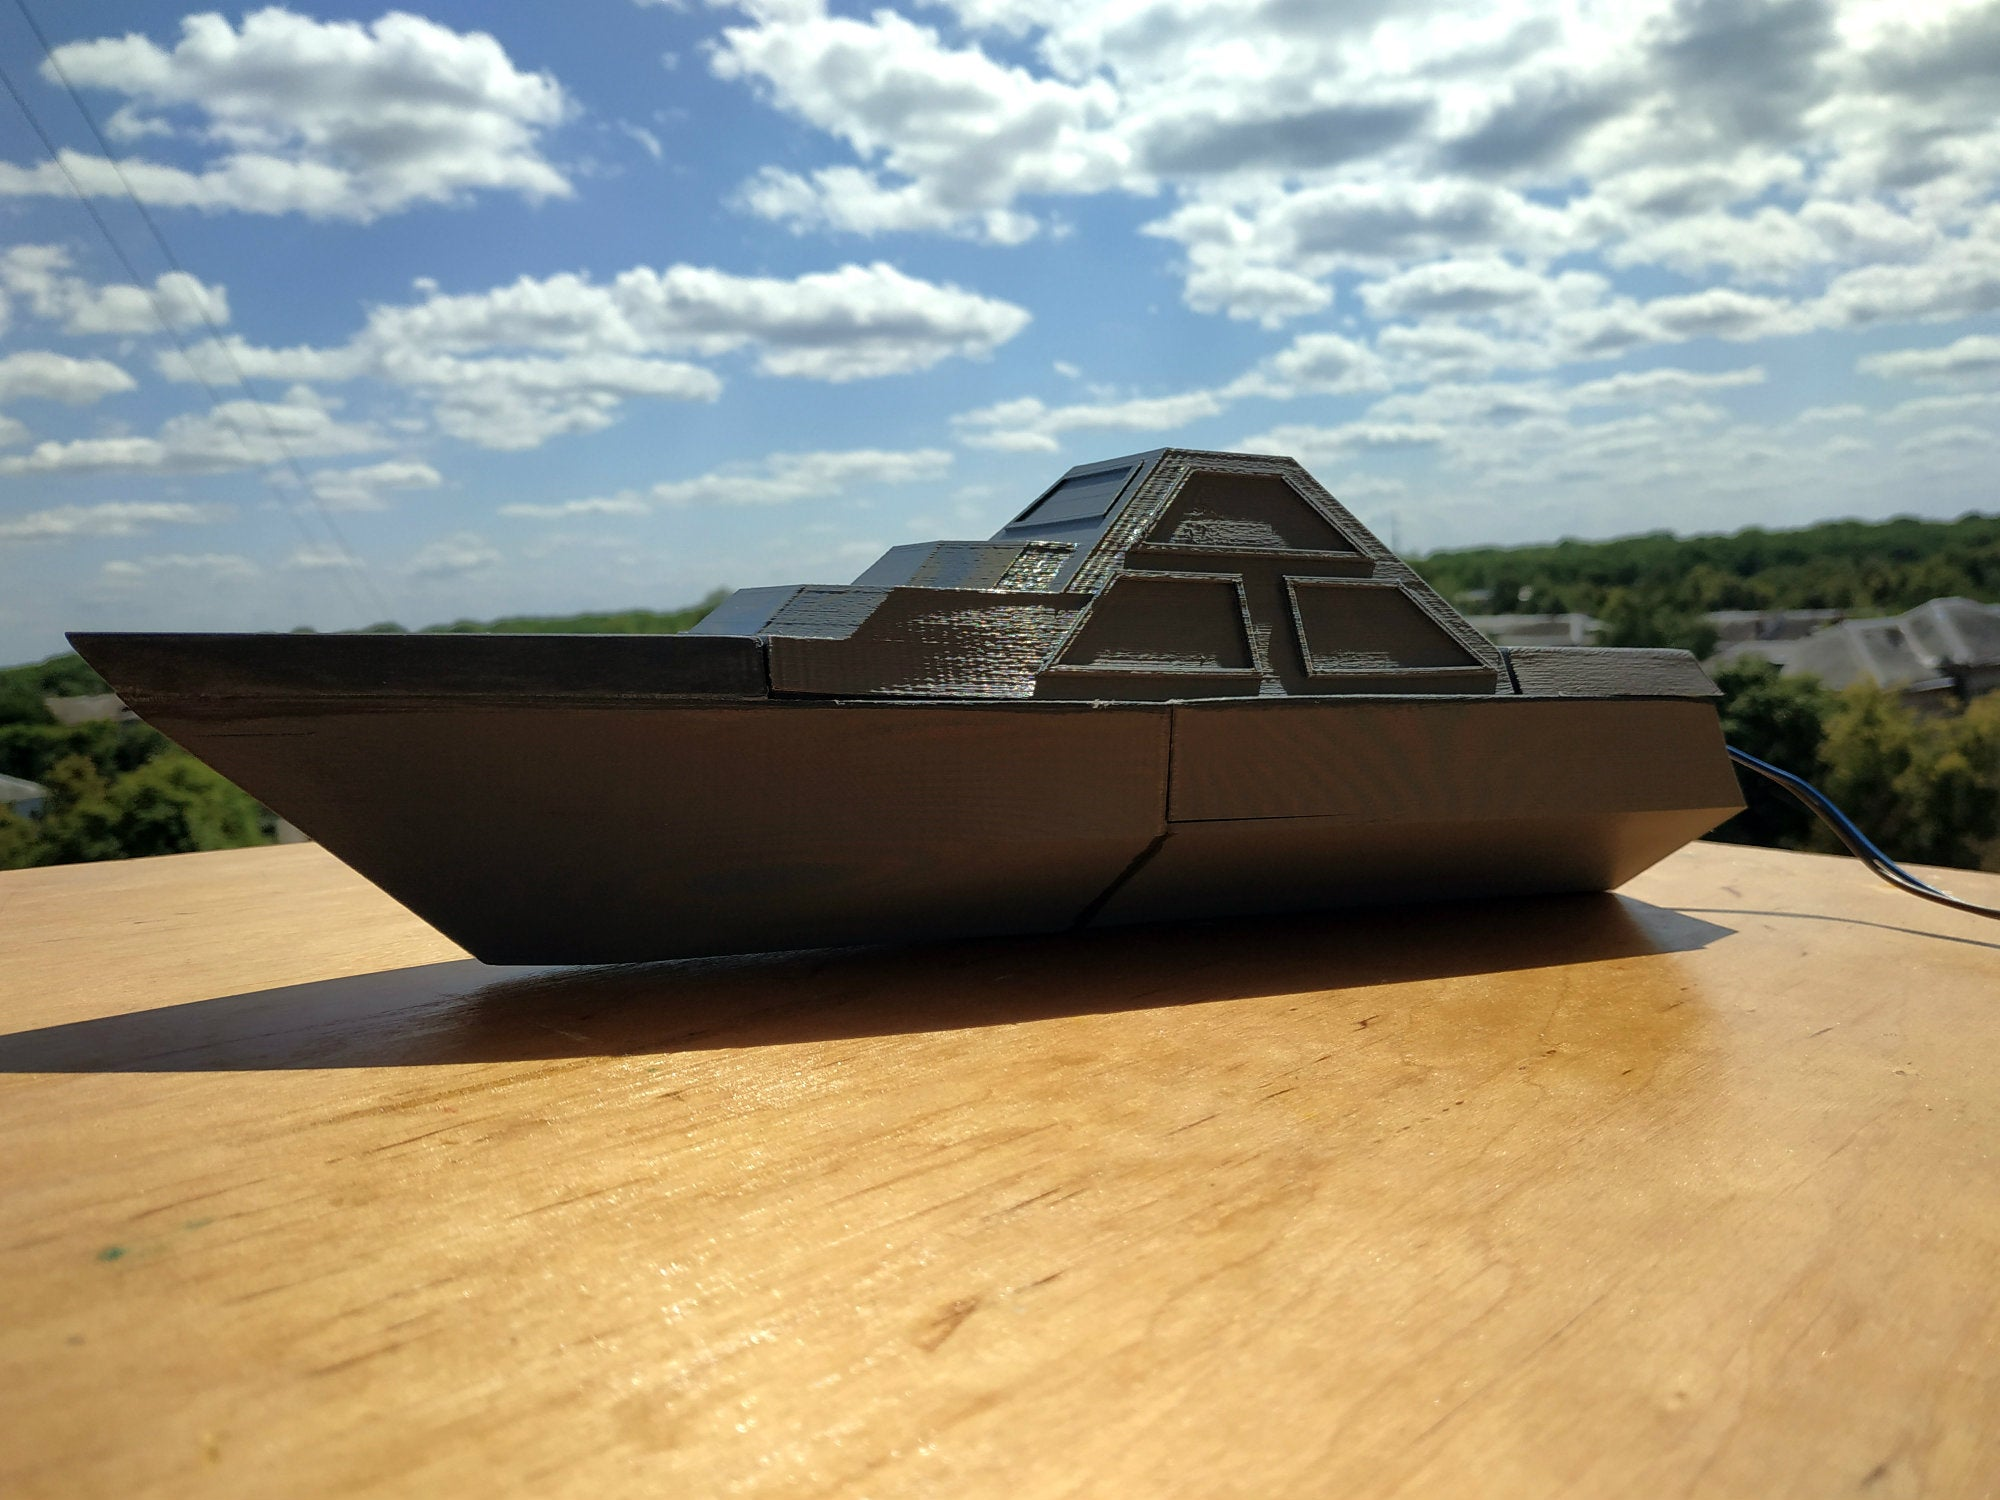 DARINS_4_1.jpg Download free STL file DARINS - stealth boat with reactionless propulsion drive • 3D printer design, TanyaAkinora